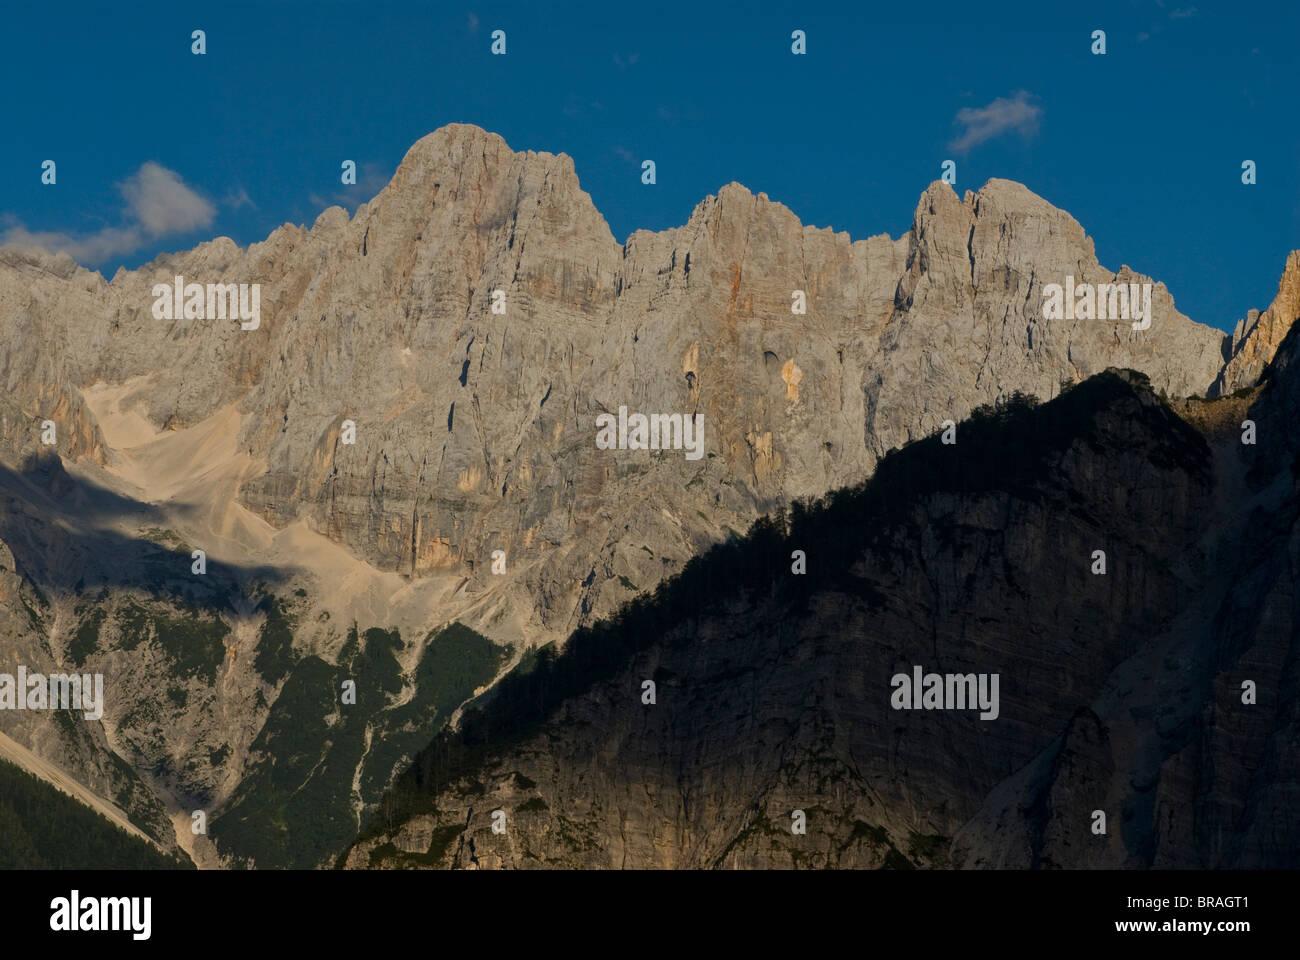 Vrsic Pass in the Julian Alps, Slovenia, Europe - Stock Image